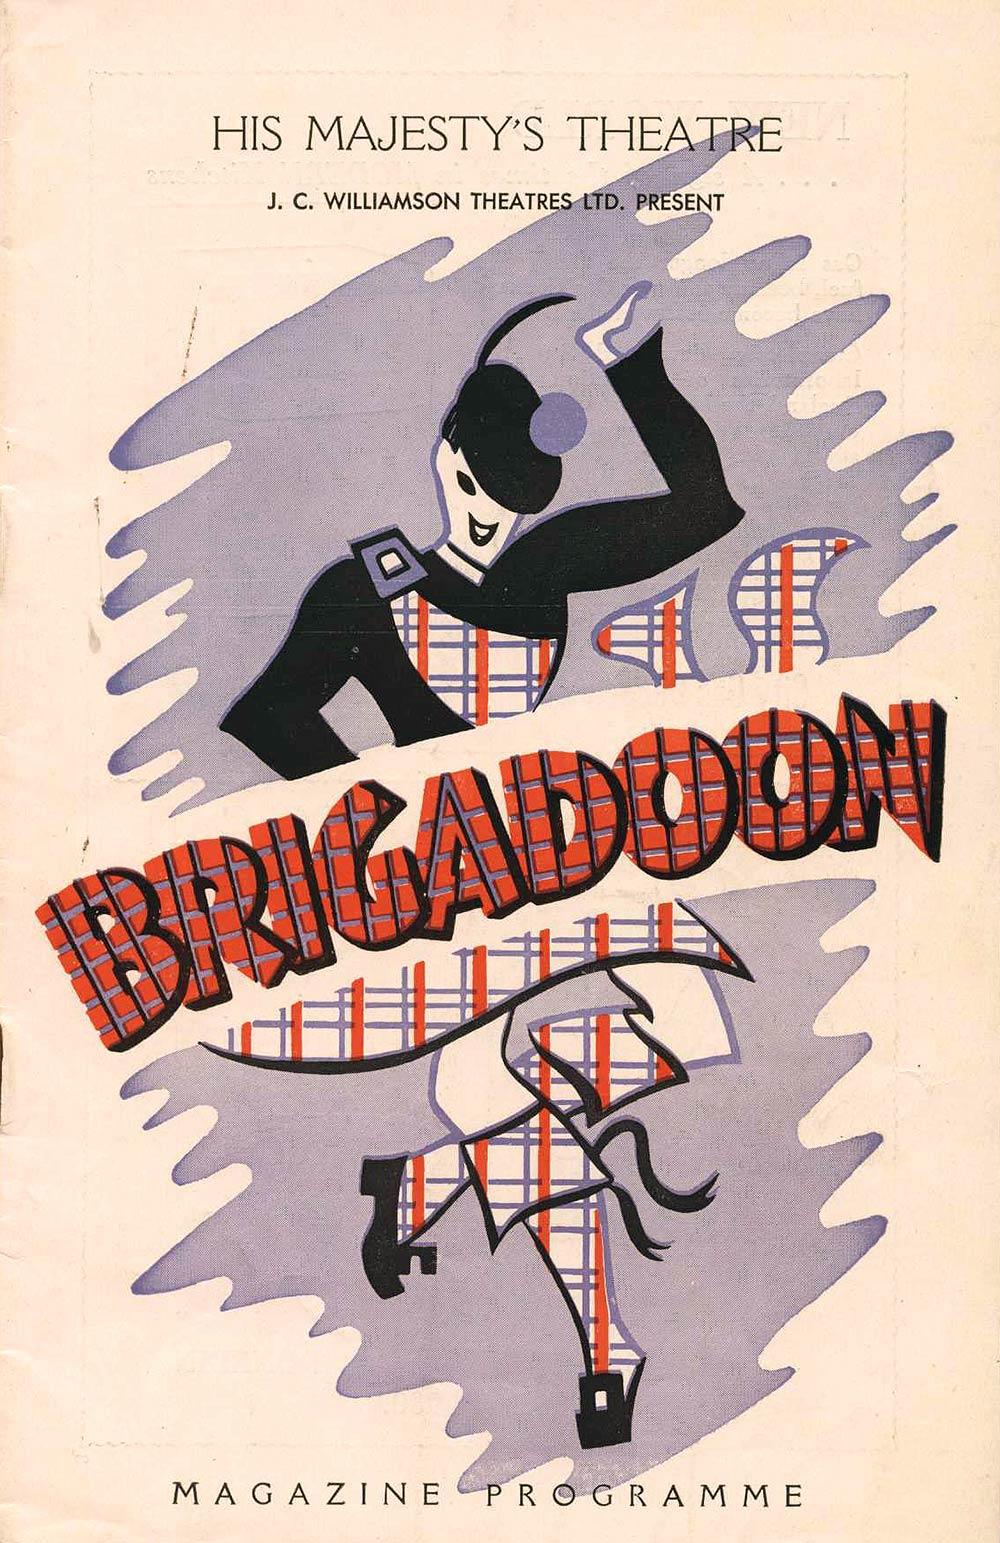 <em>Brigadoon</em>. Book and lyrics by Alan J. Lerner; music by Frederick Loewe. (J.C. Williamson Ltd.) His Majesty's Theatre, Dunedin, [1952]